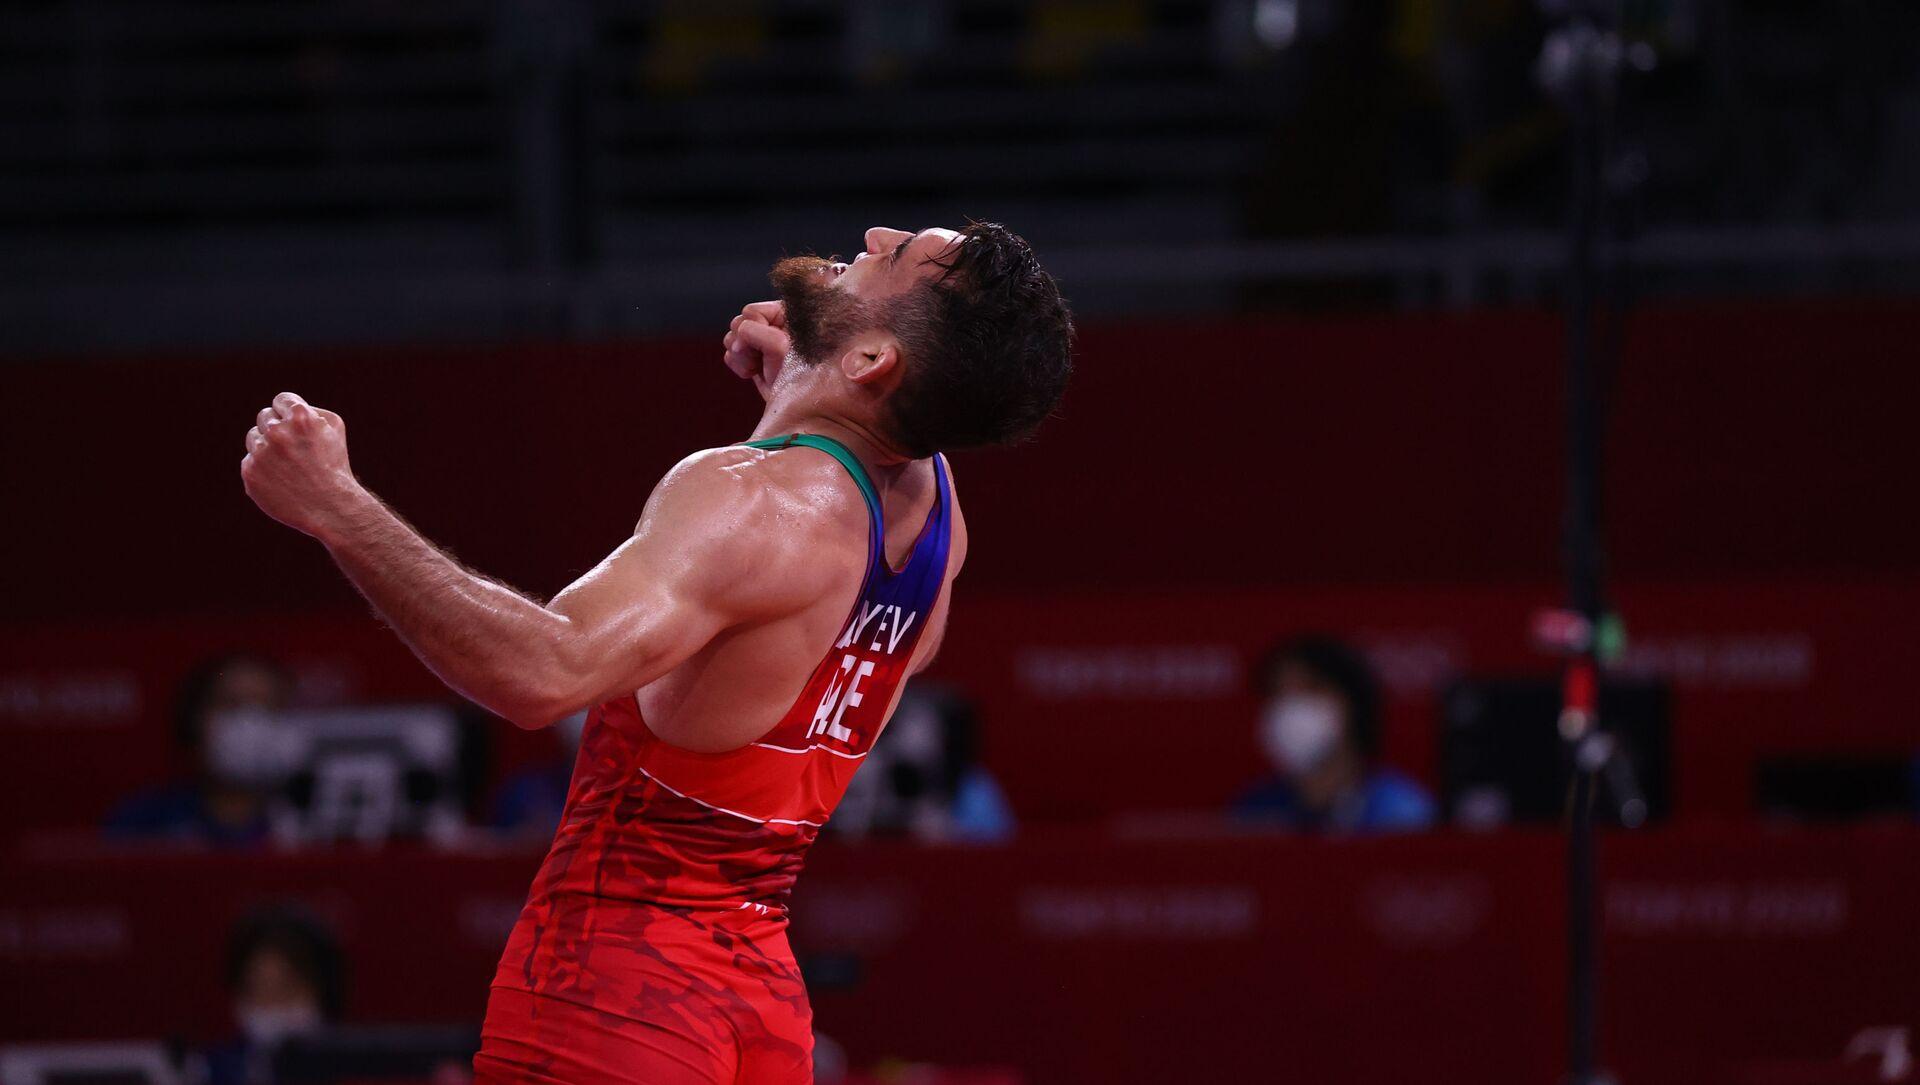 Азербайджанский борец Гаджи Алиев на Олимпийских играх в Токио - Sputnik Азербайджан, 1920, 06.08.2021